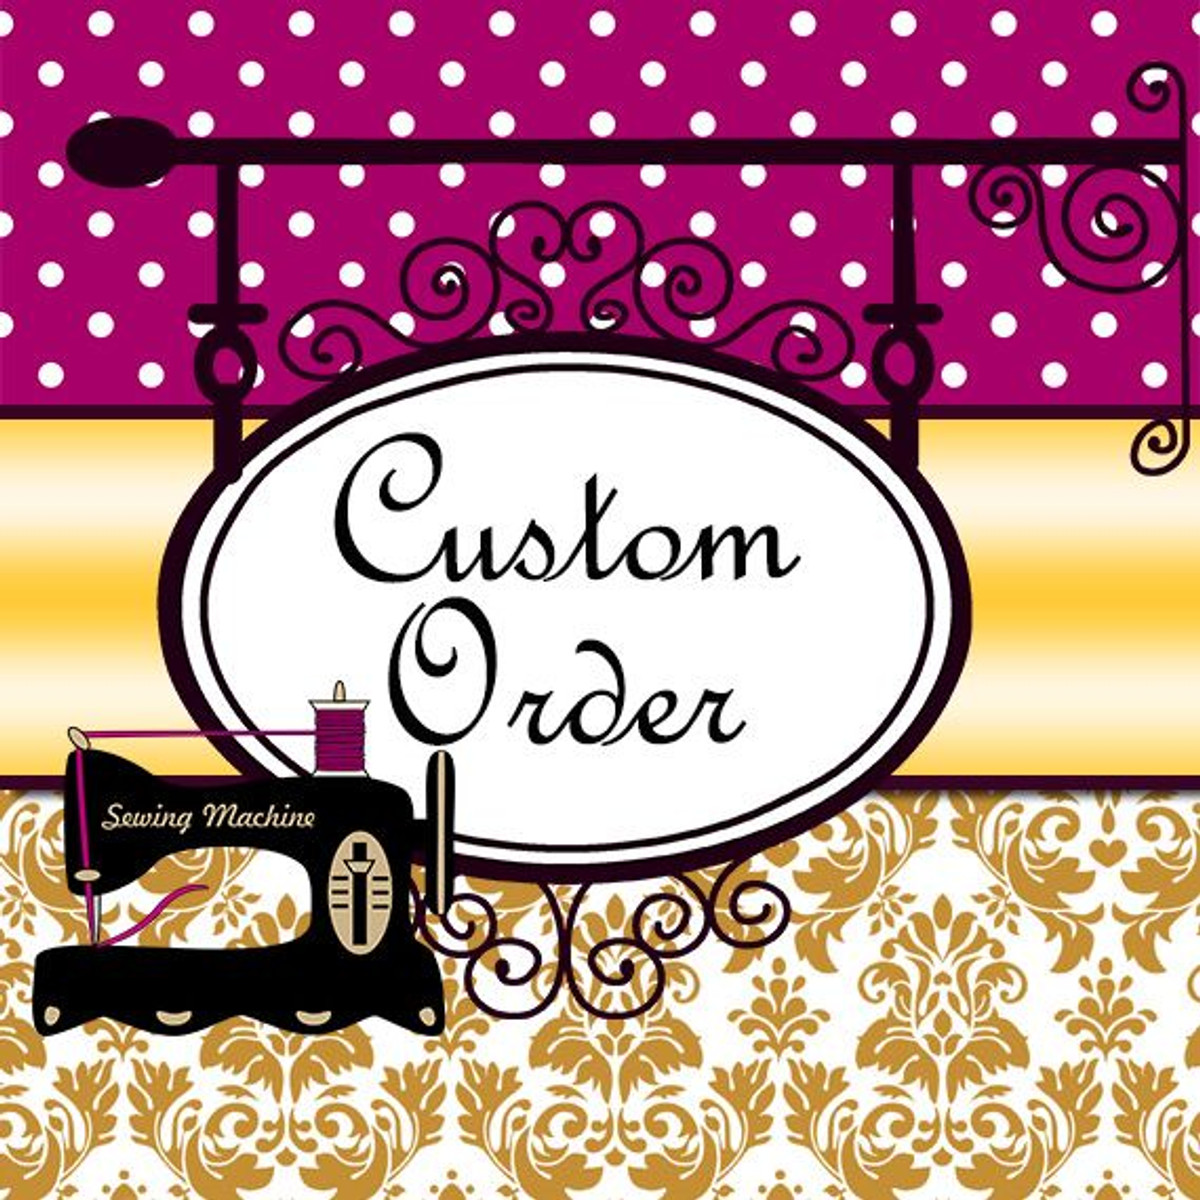 Custom Wedding Dress for CotyR